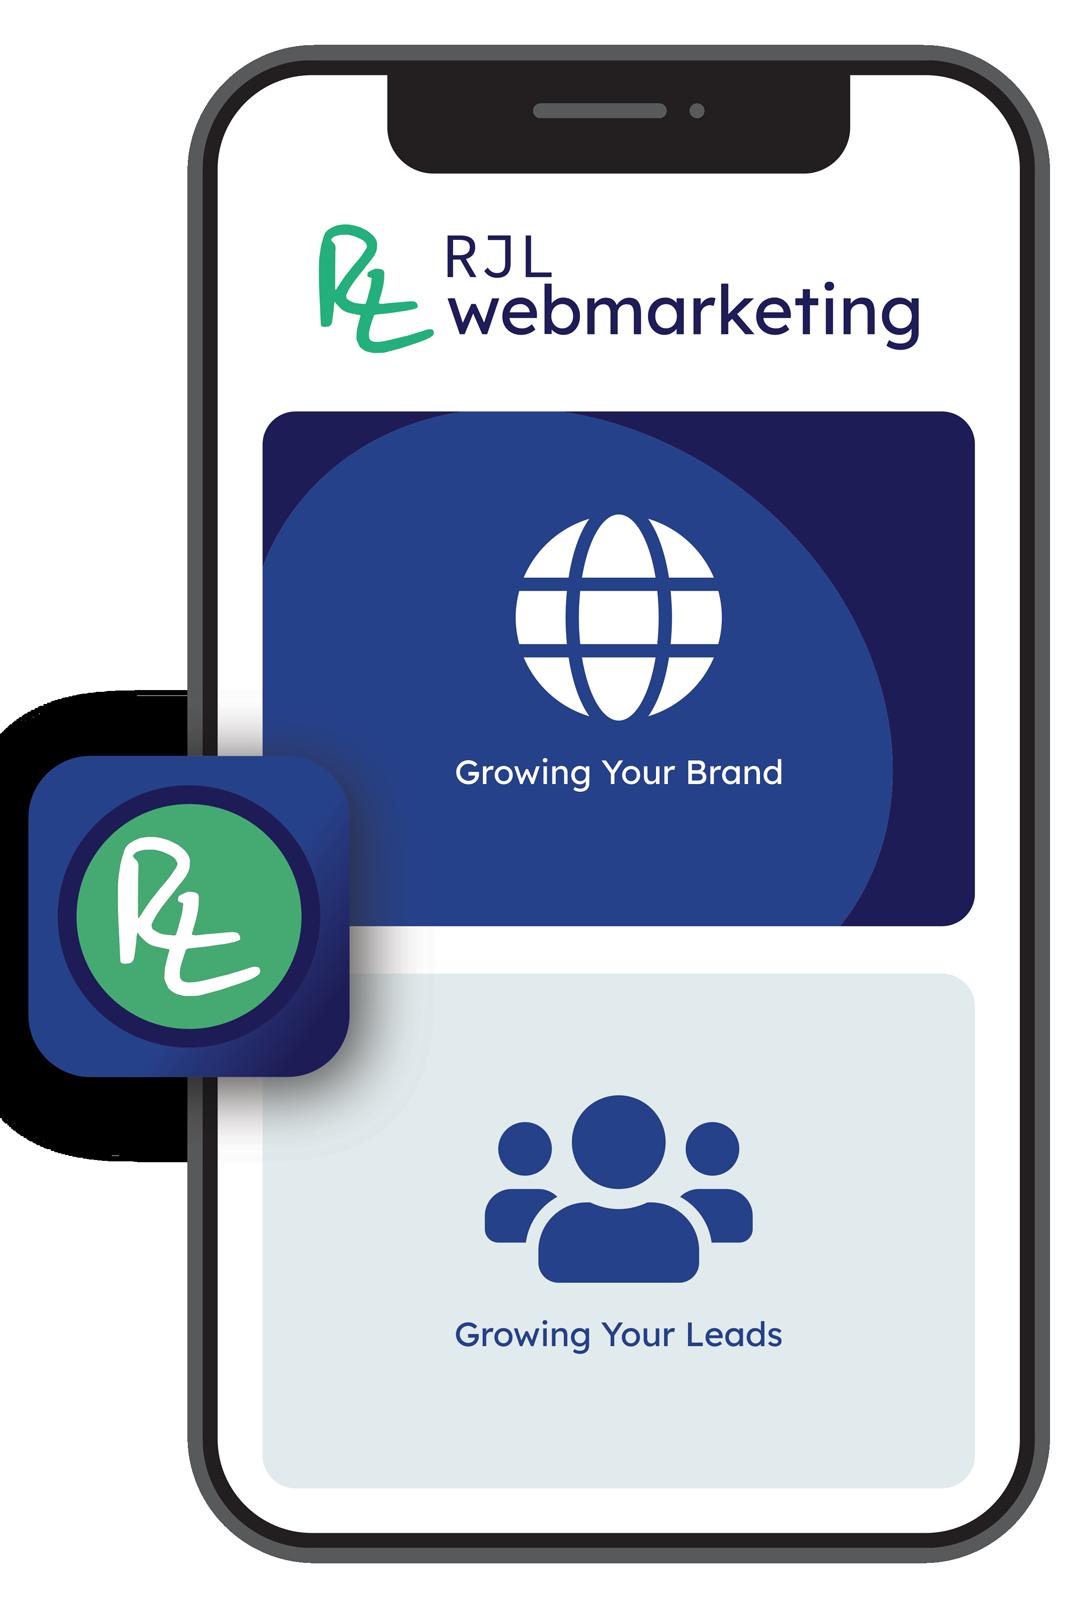 rjl web marketing websites business marketing consultant phone